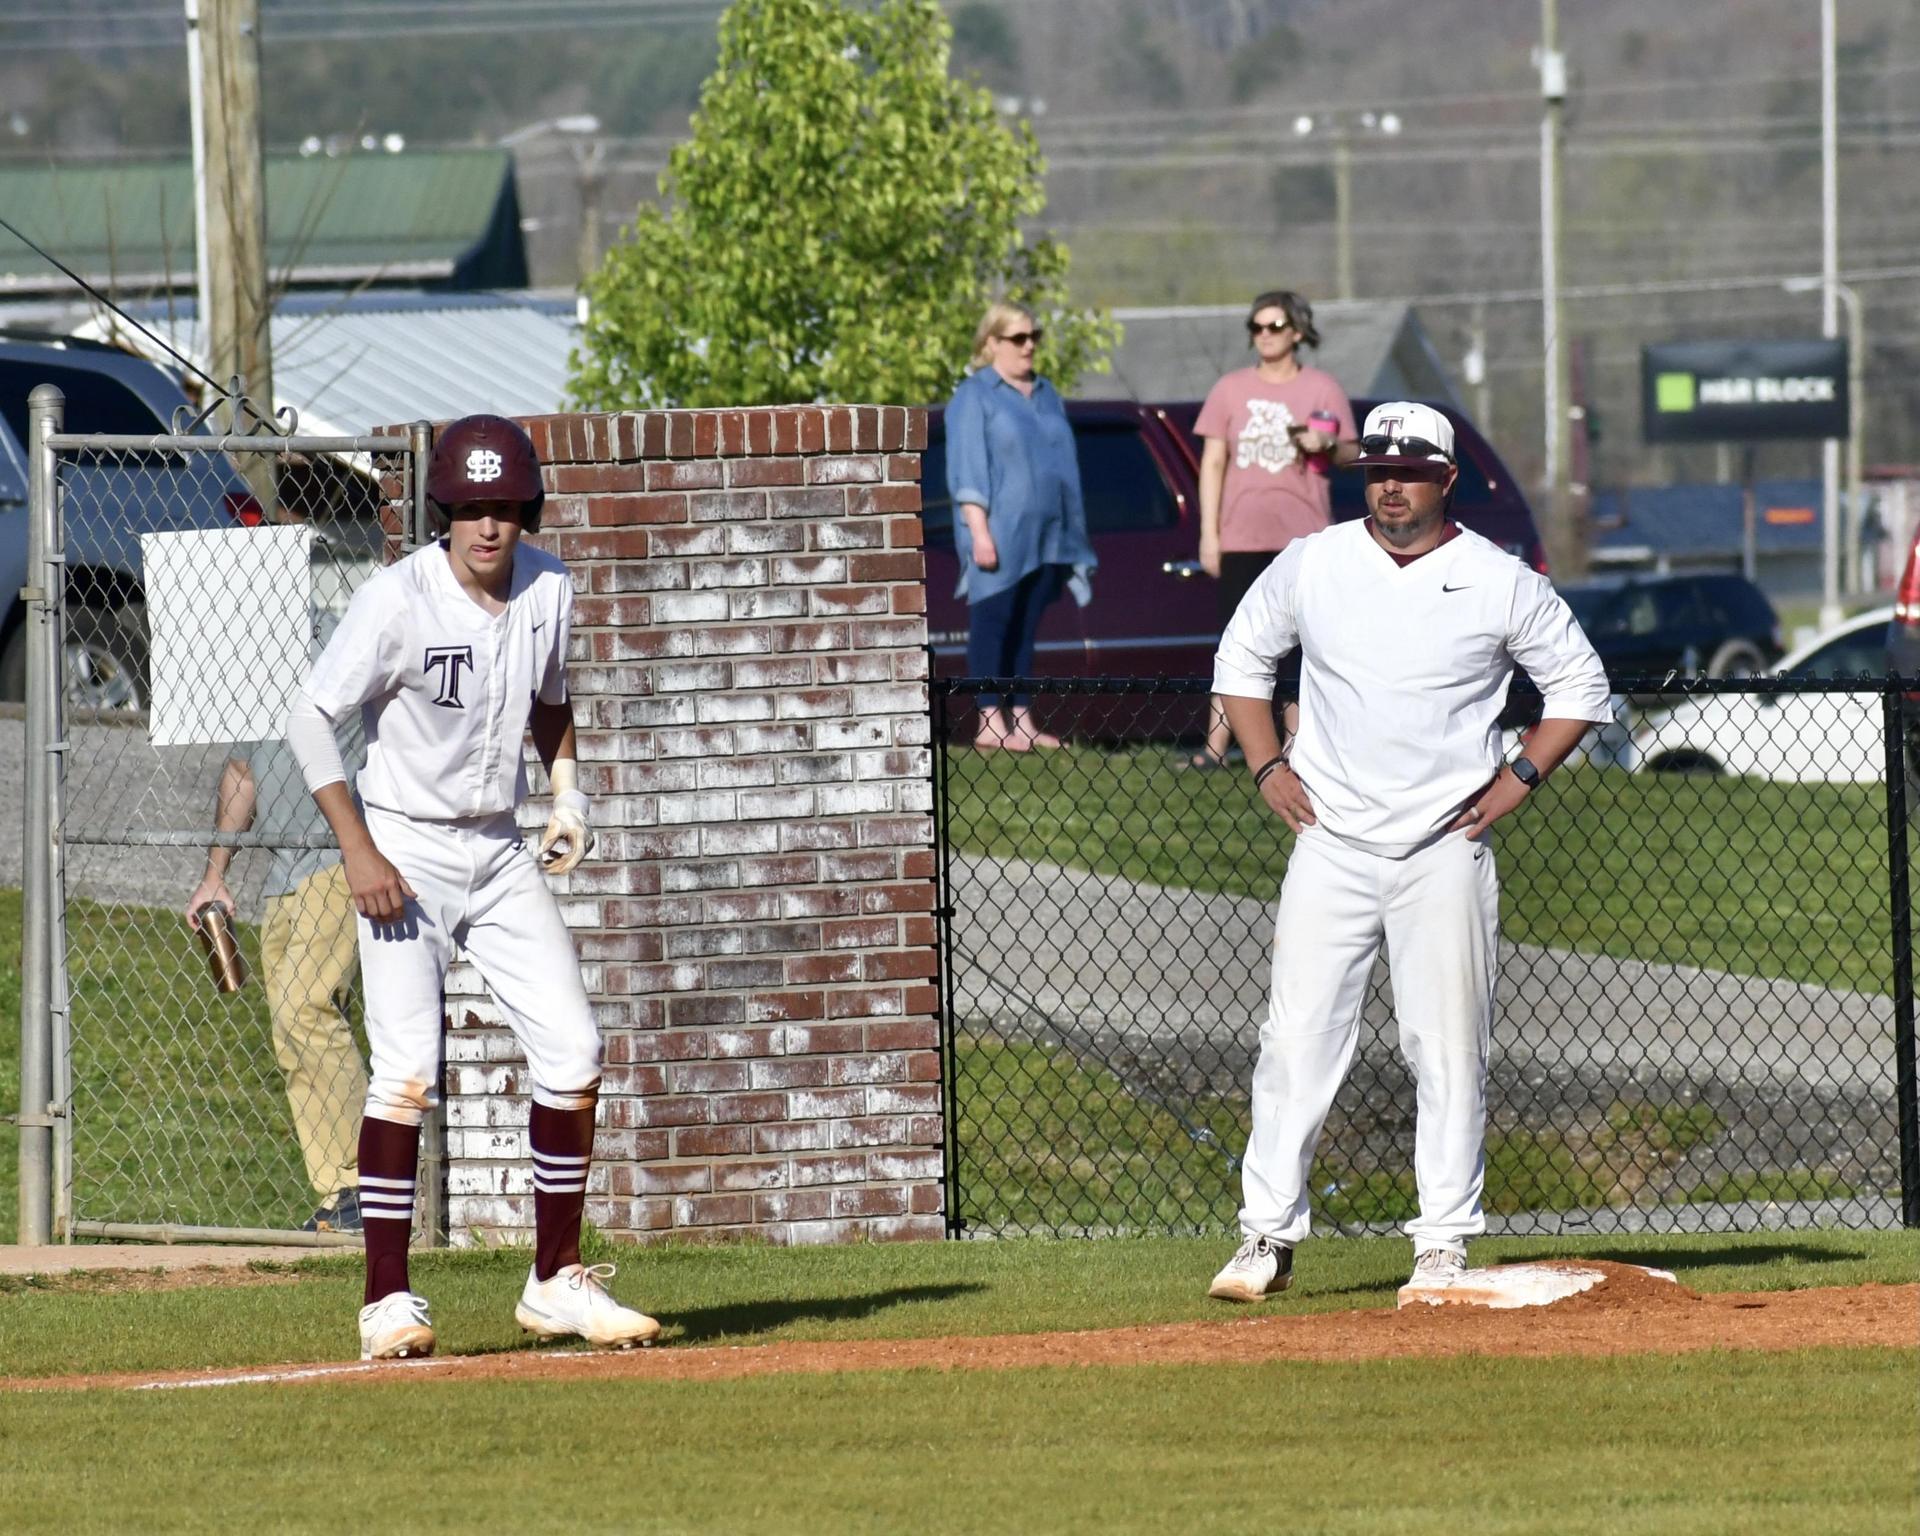 Coach on third base